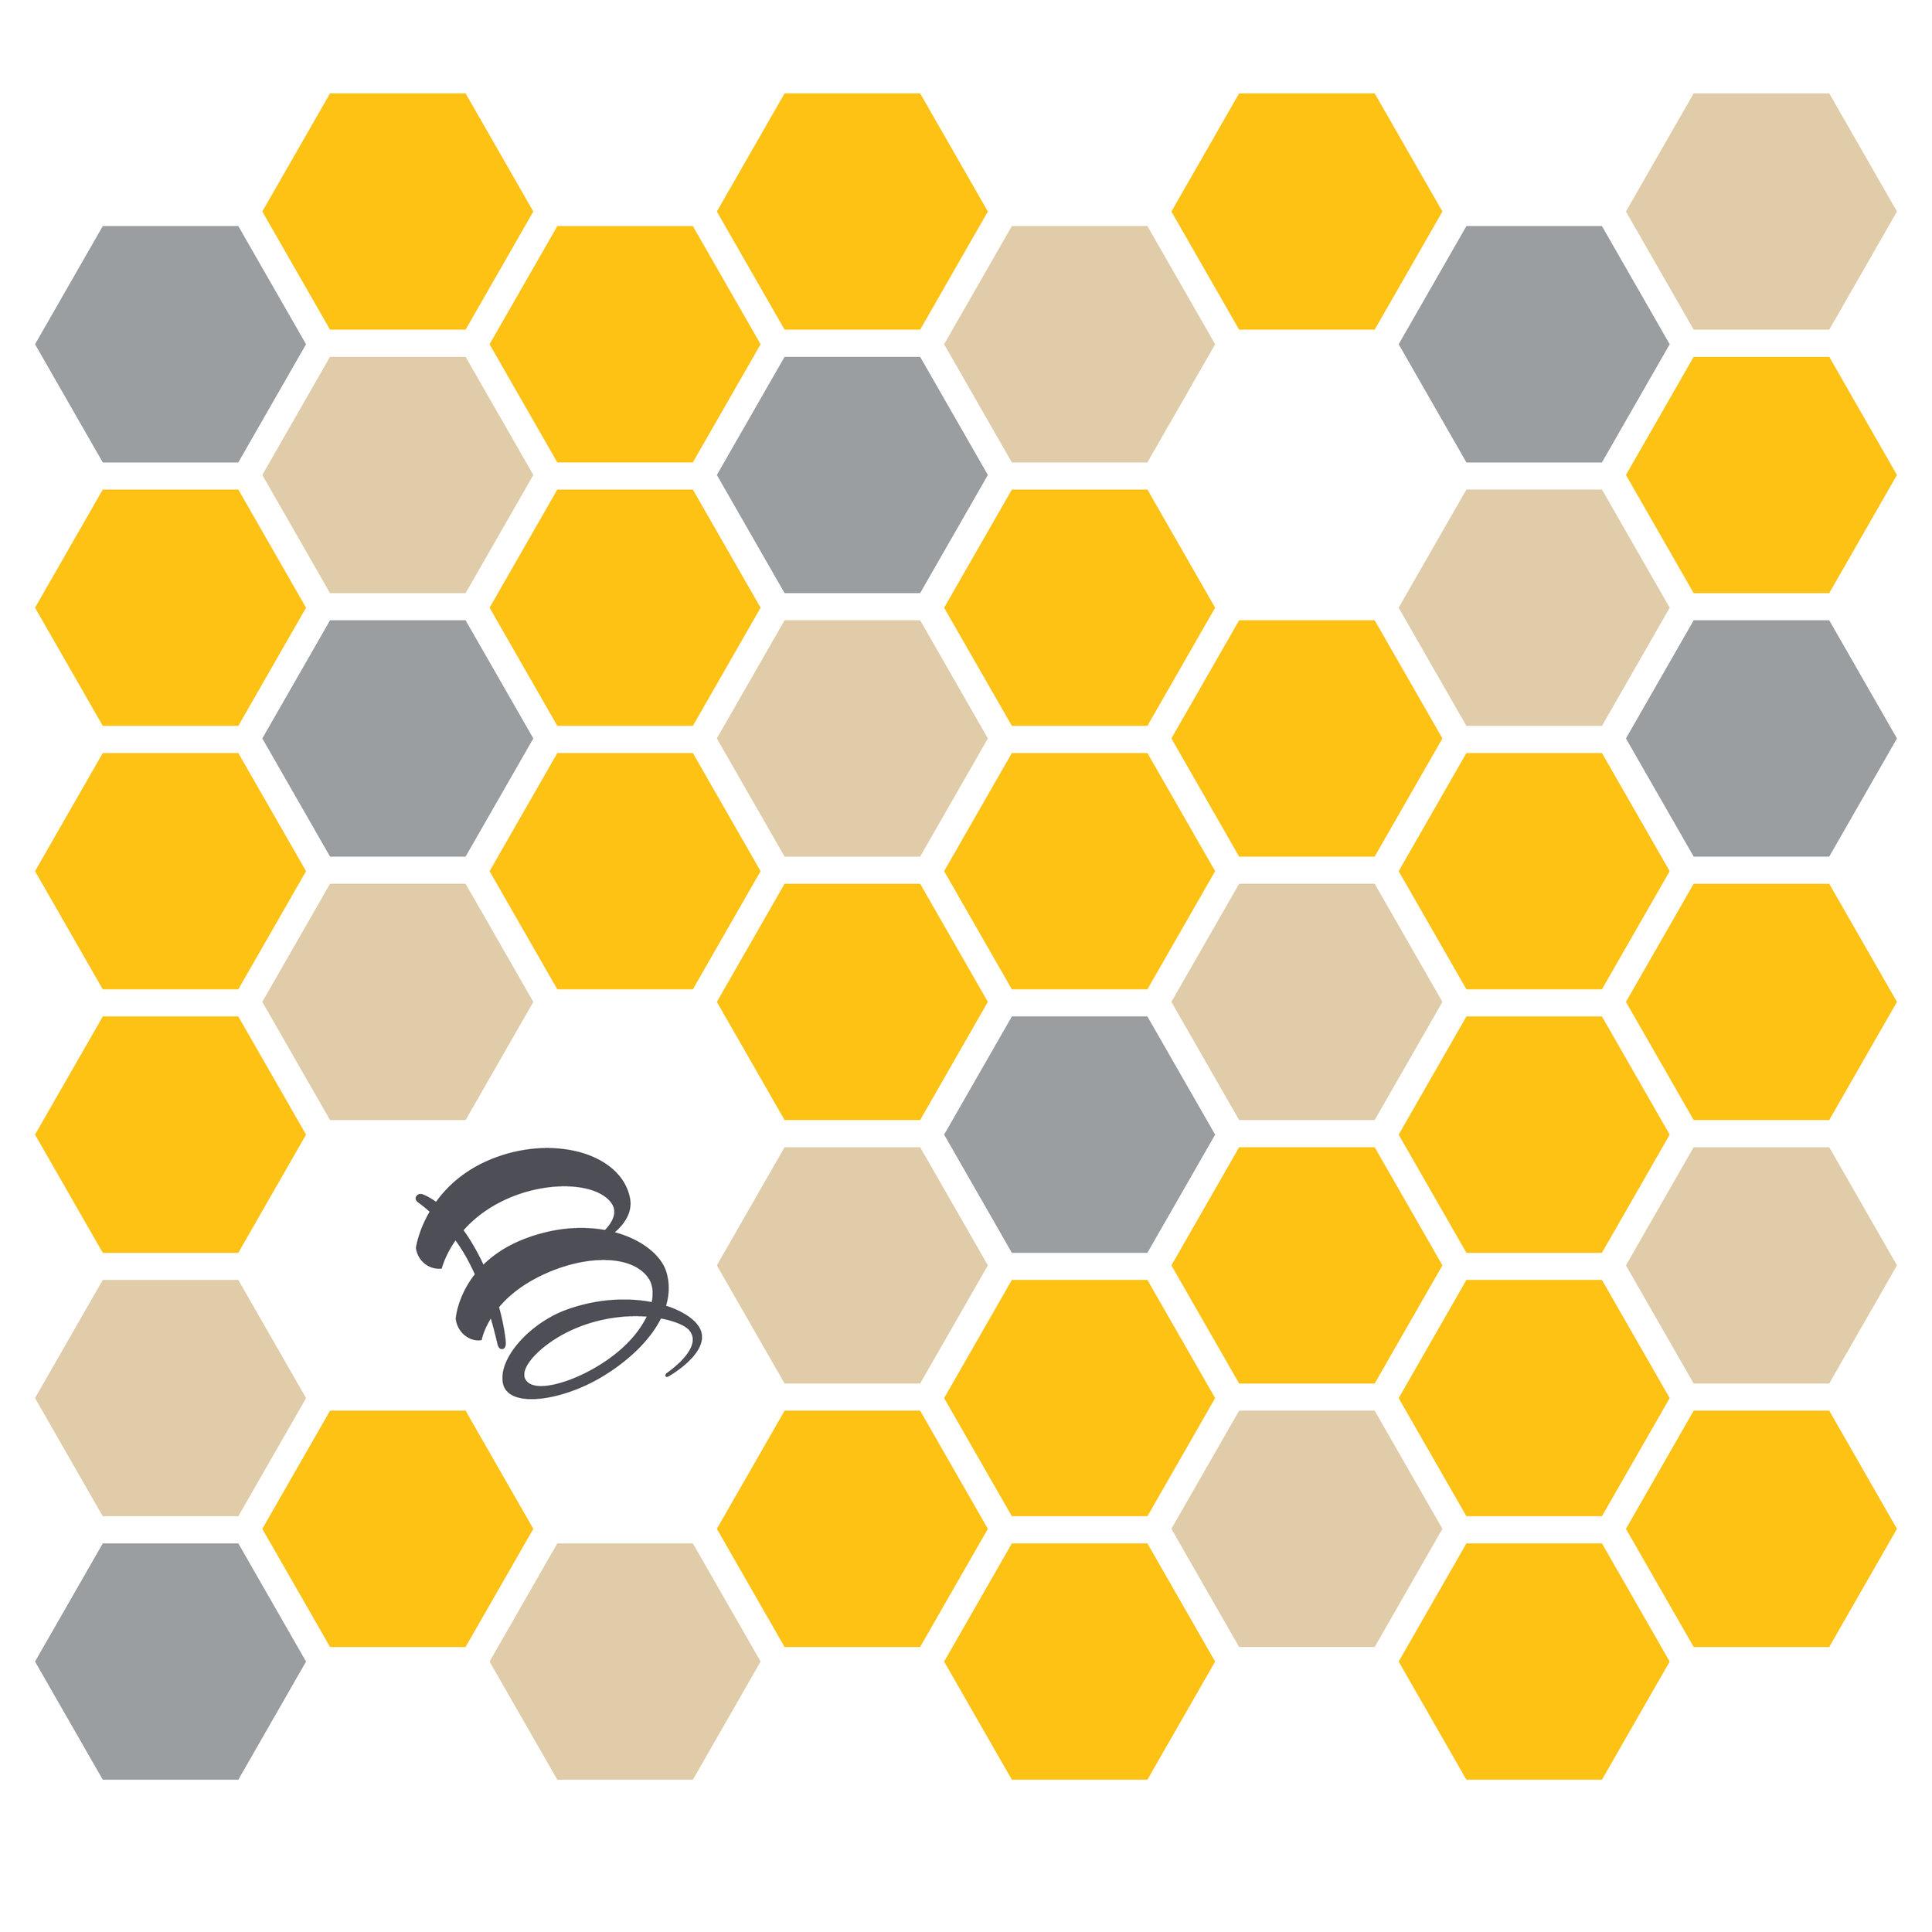 The Bizzy-logo-wallpaper.jpg